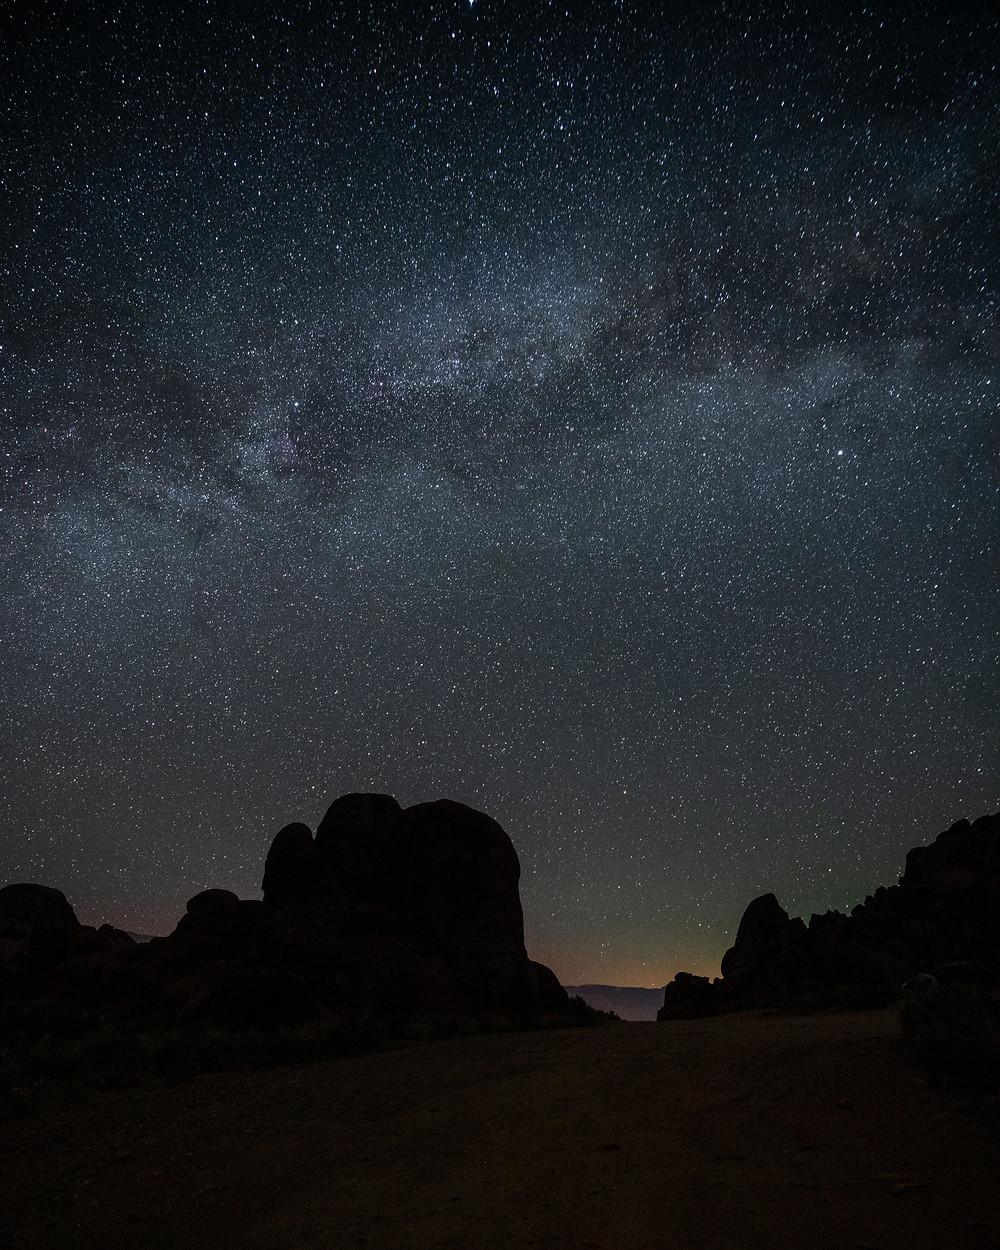 Star gazing and Milky Way views in the Sedona night skies